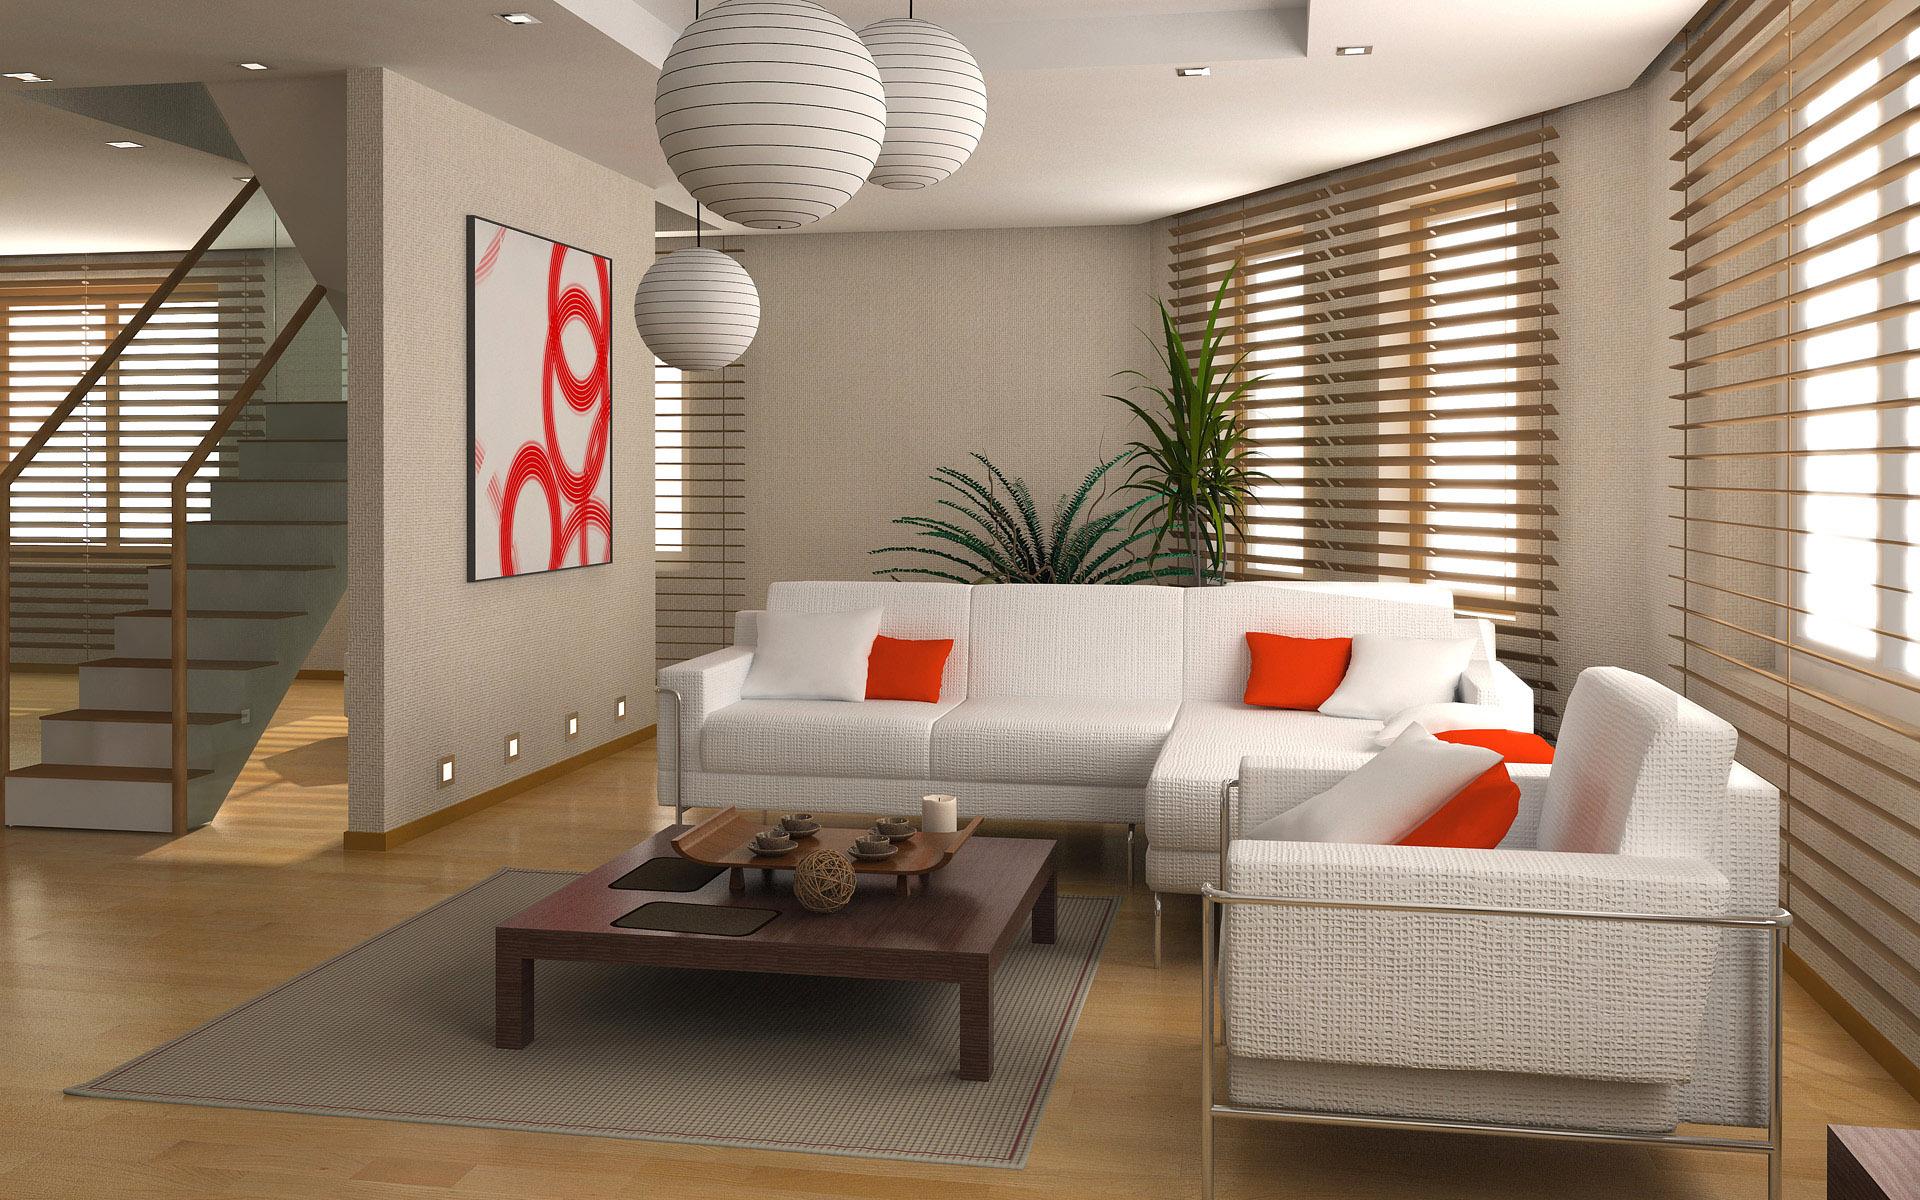 drwaing-room-ideas2 drwaing room ideas